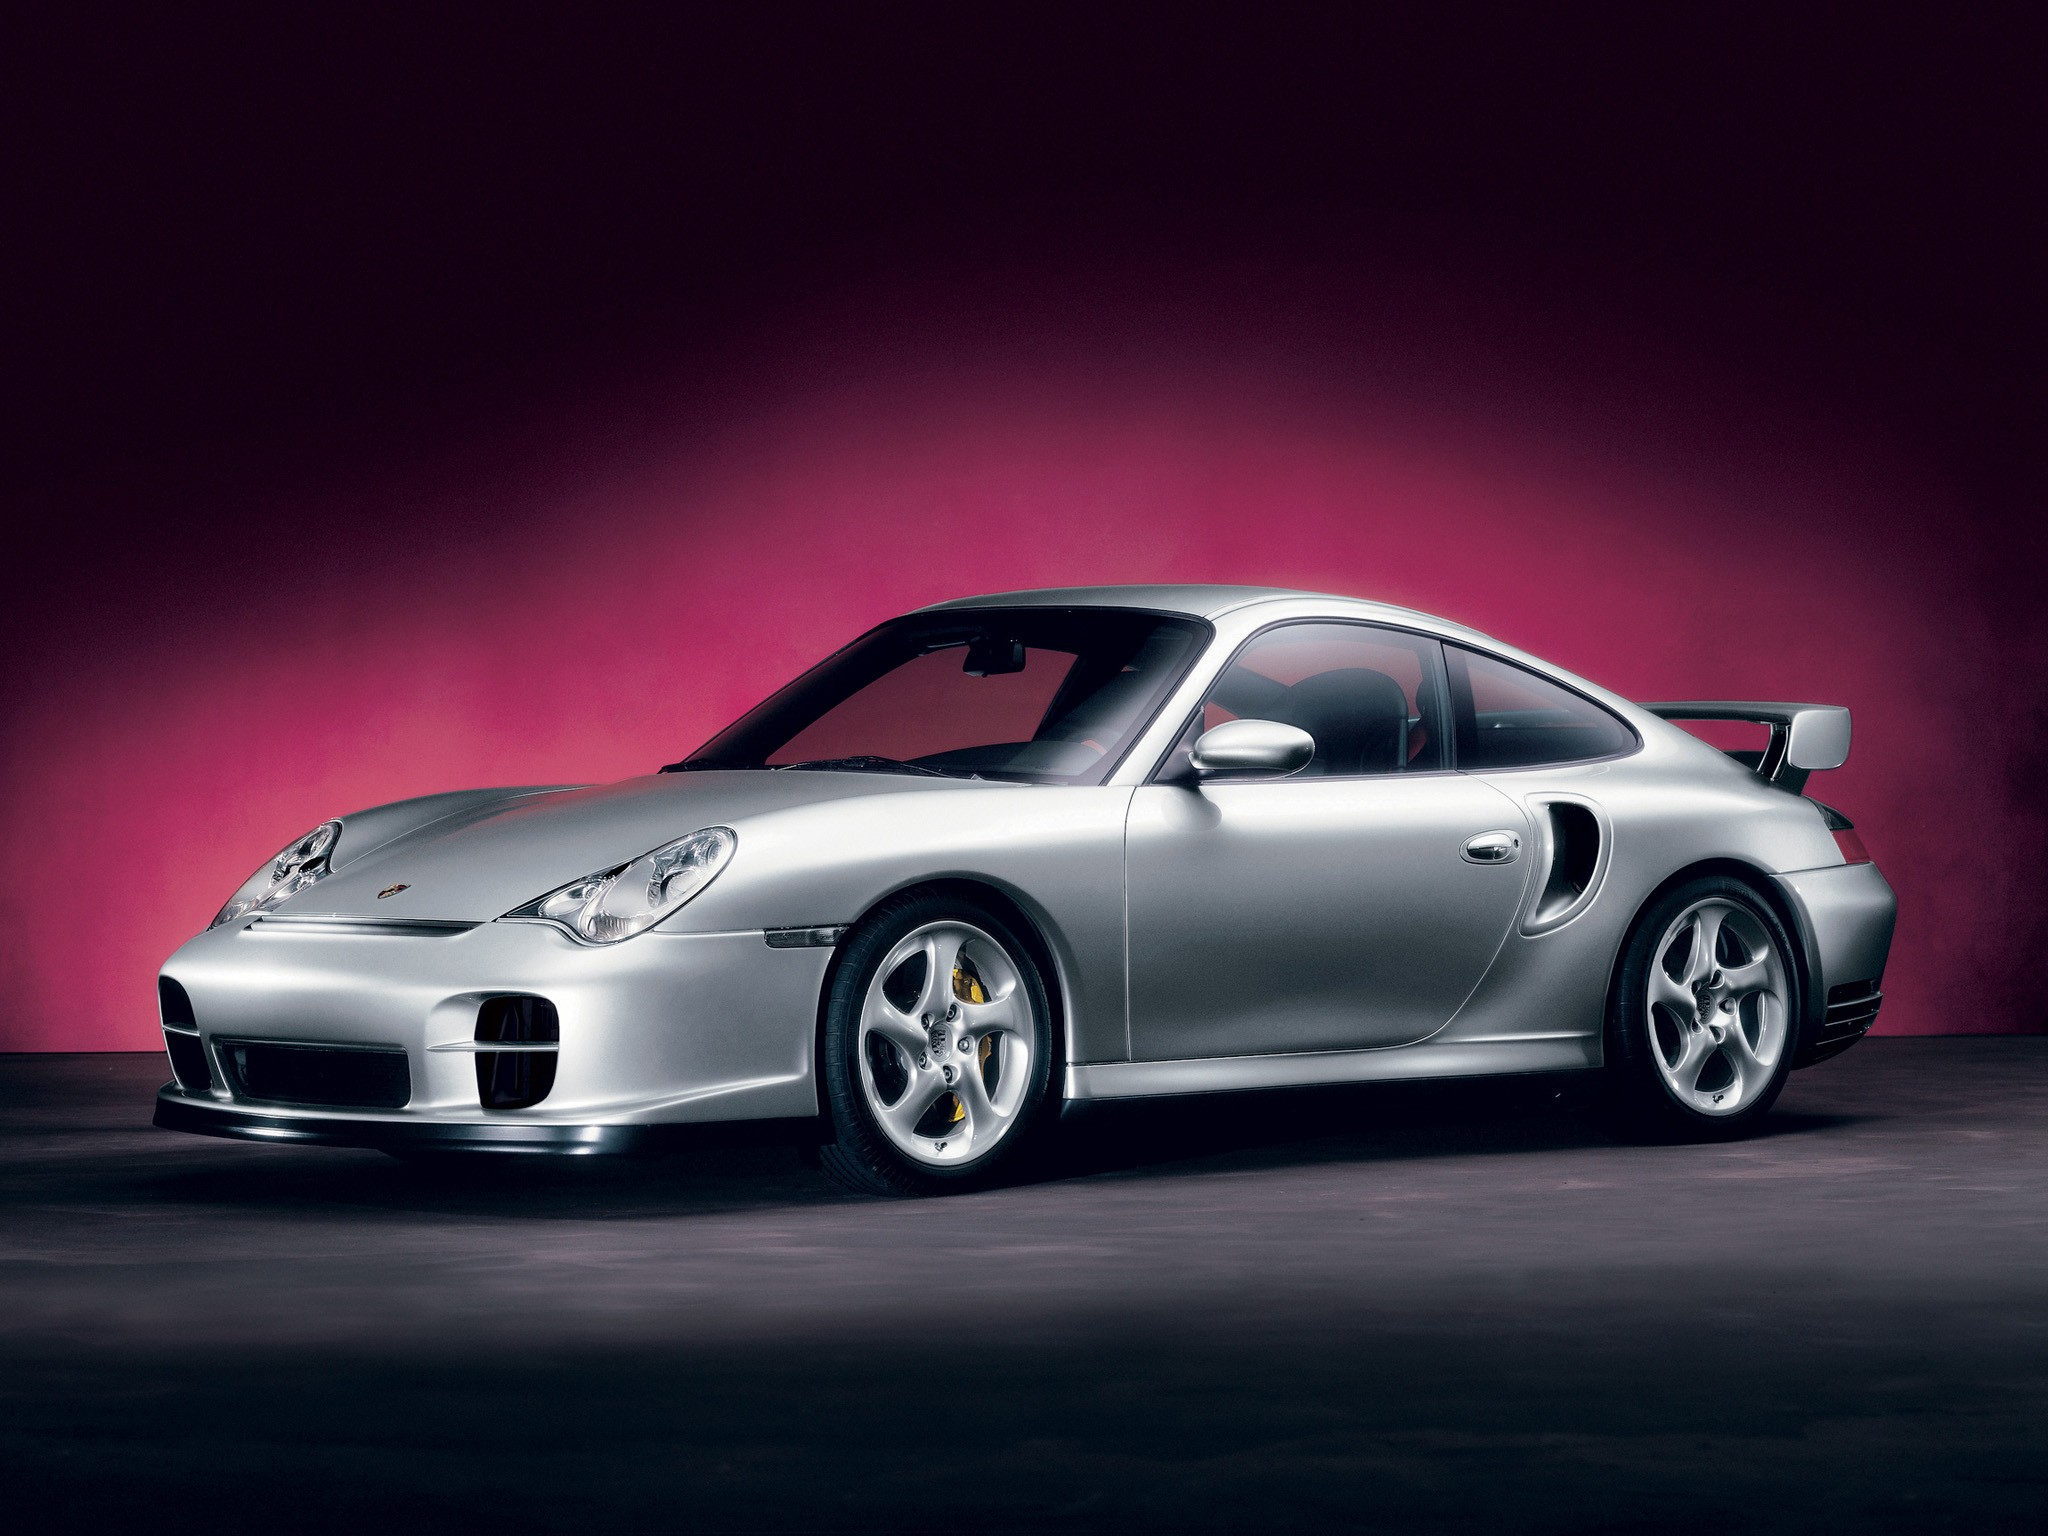 porsche 911 gt2 996 2001 2002 2003 2004 2005 2006 autoevolution. Black Bedroom Furniture Sets. Home Design Ideas